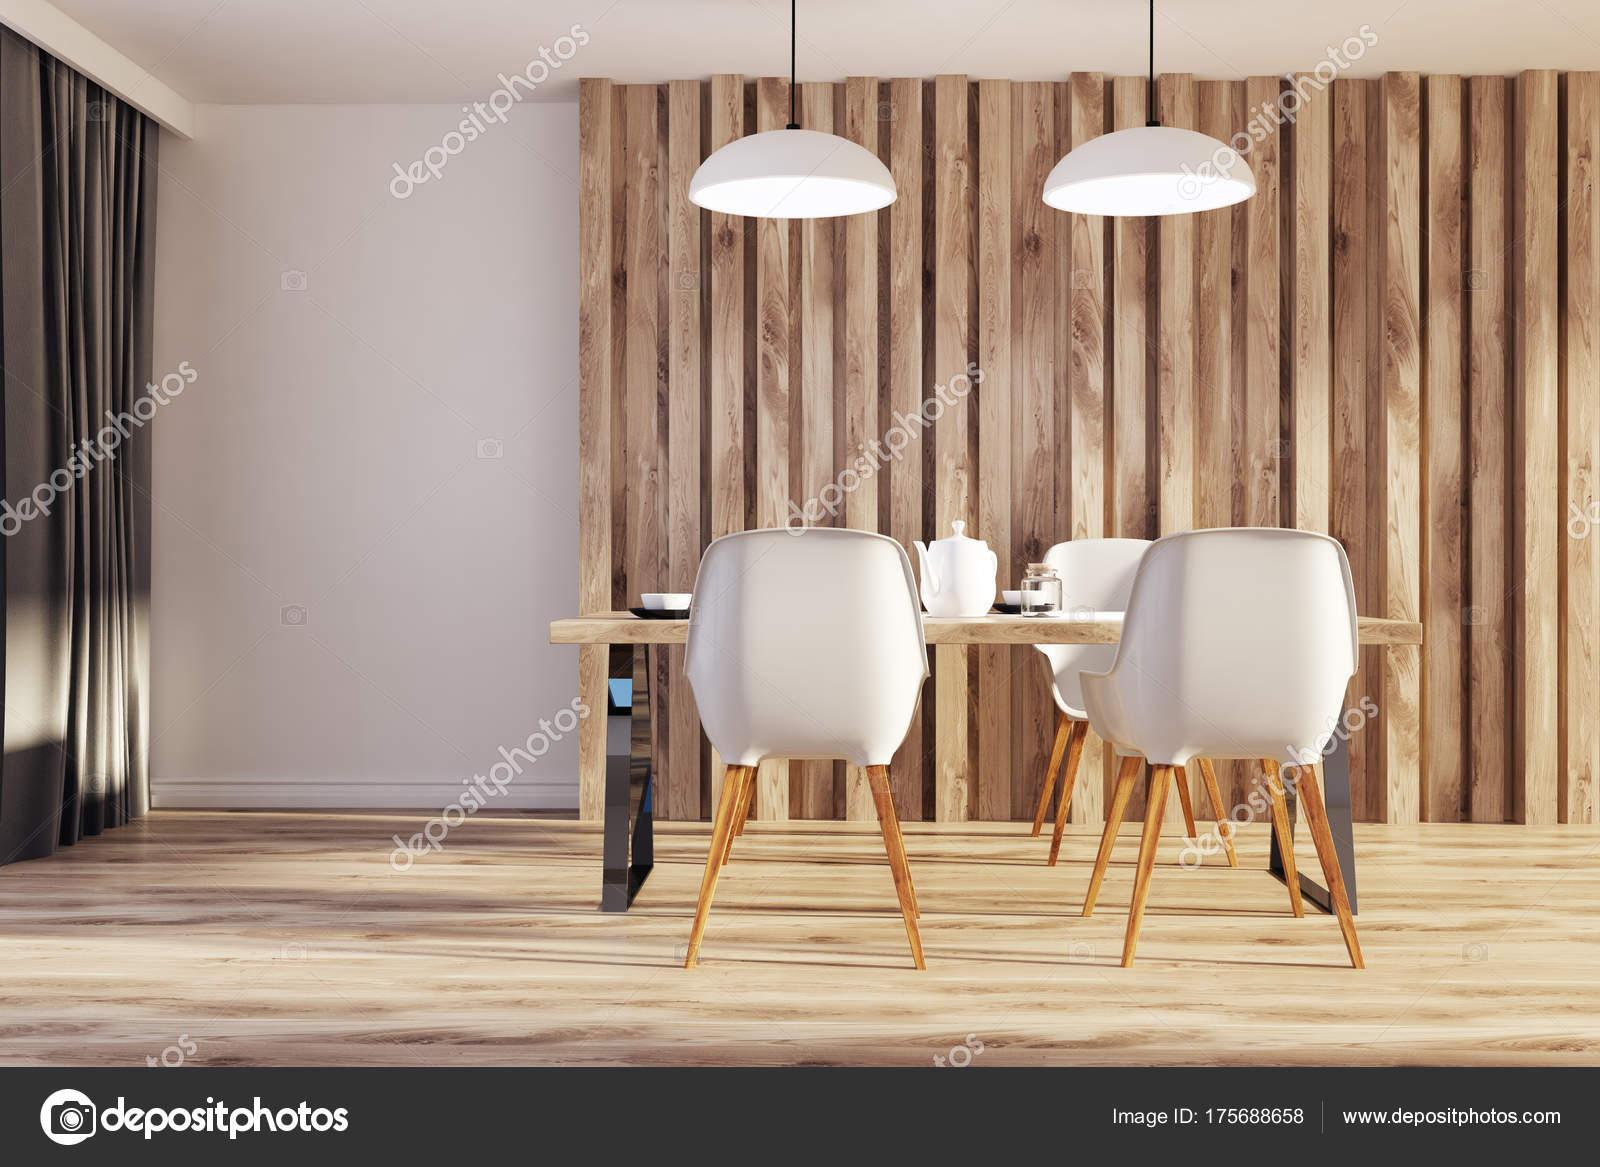 Sedie Bianche E Legno : Sedie da pranzo in legno e bianco bianco u foto stock